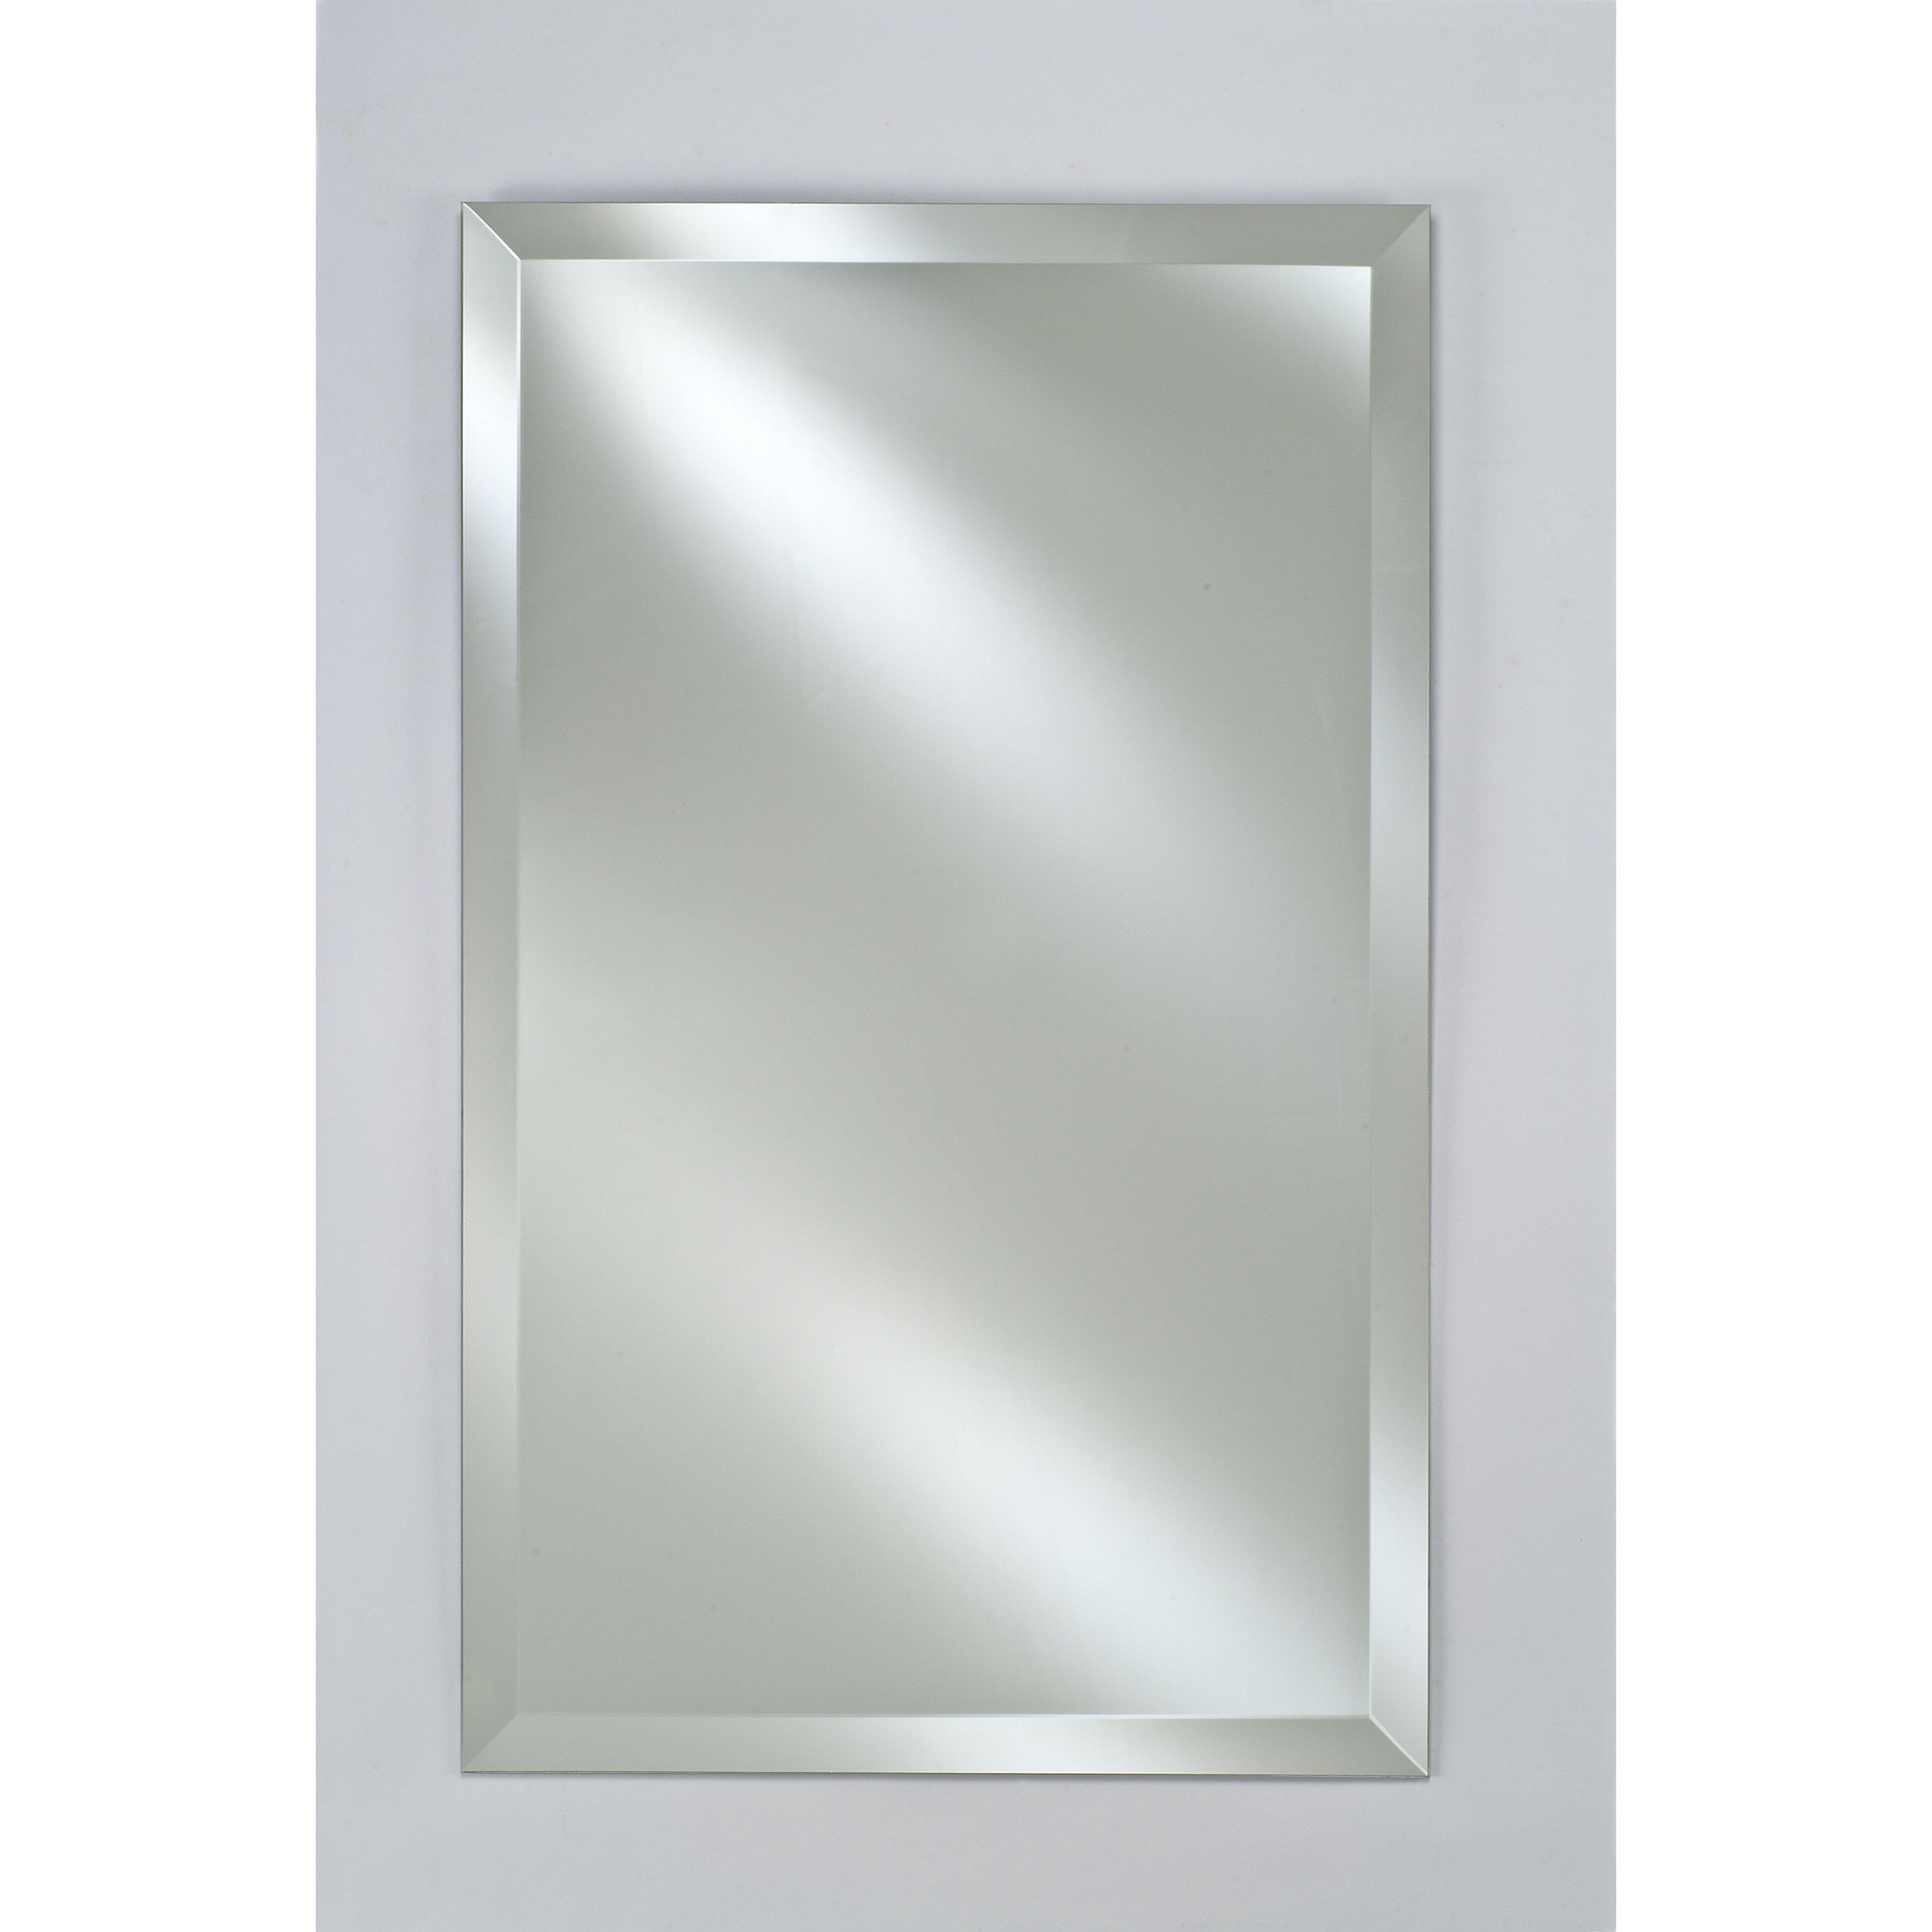 Afina basix 24 x 30 recessed medicine cabinet reviews for Bathroom medicine cabinets 14 x 18